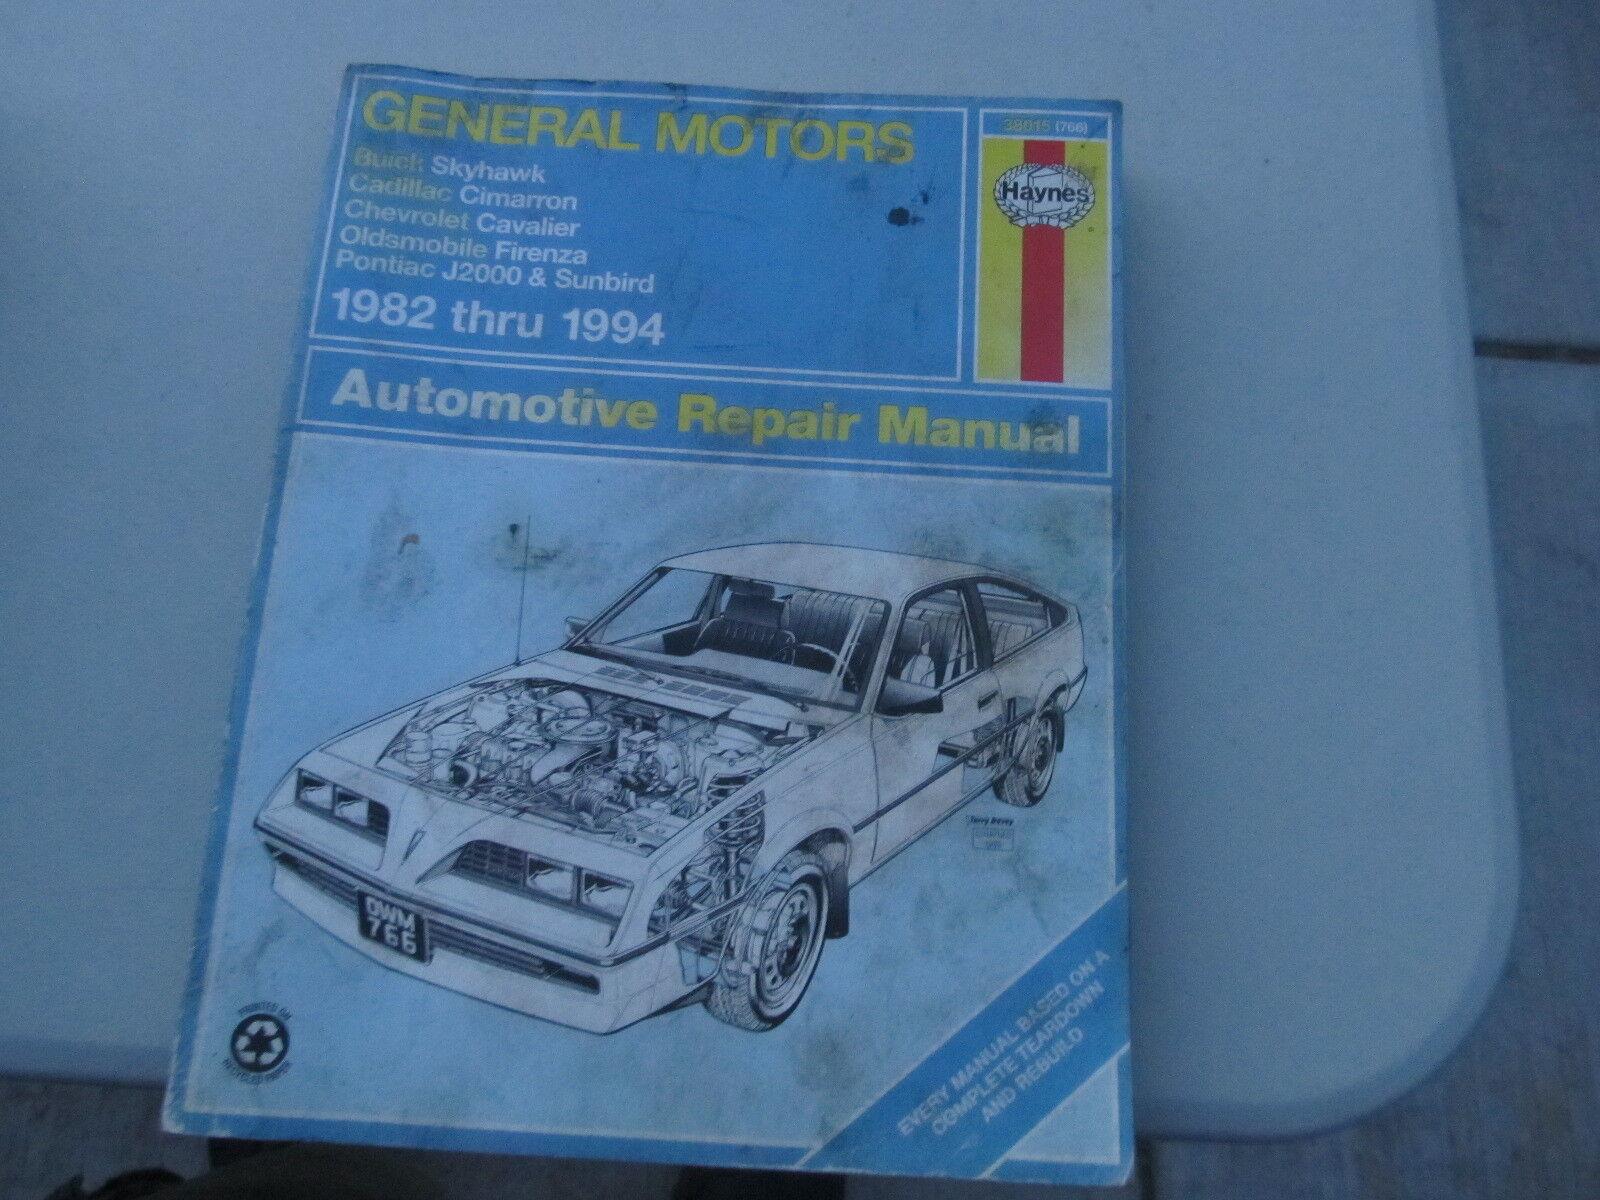 Haynes General Motors Skyhawk Cimmaron Cavalier Firenza Sunbird++ repair manual